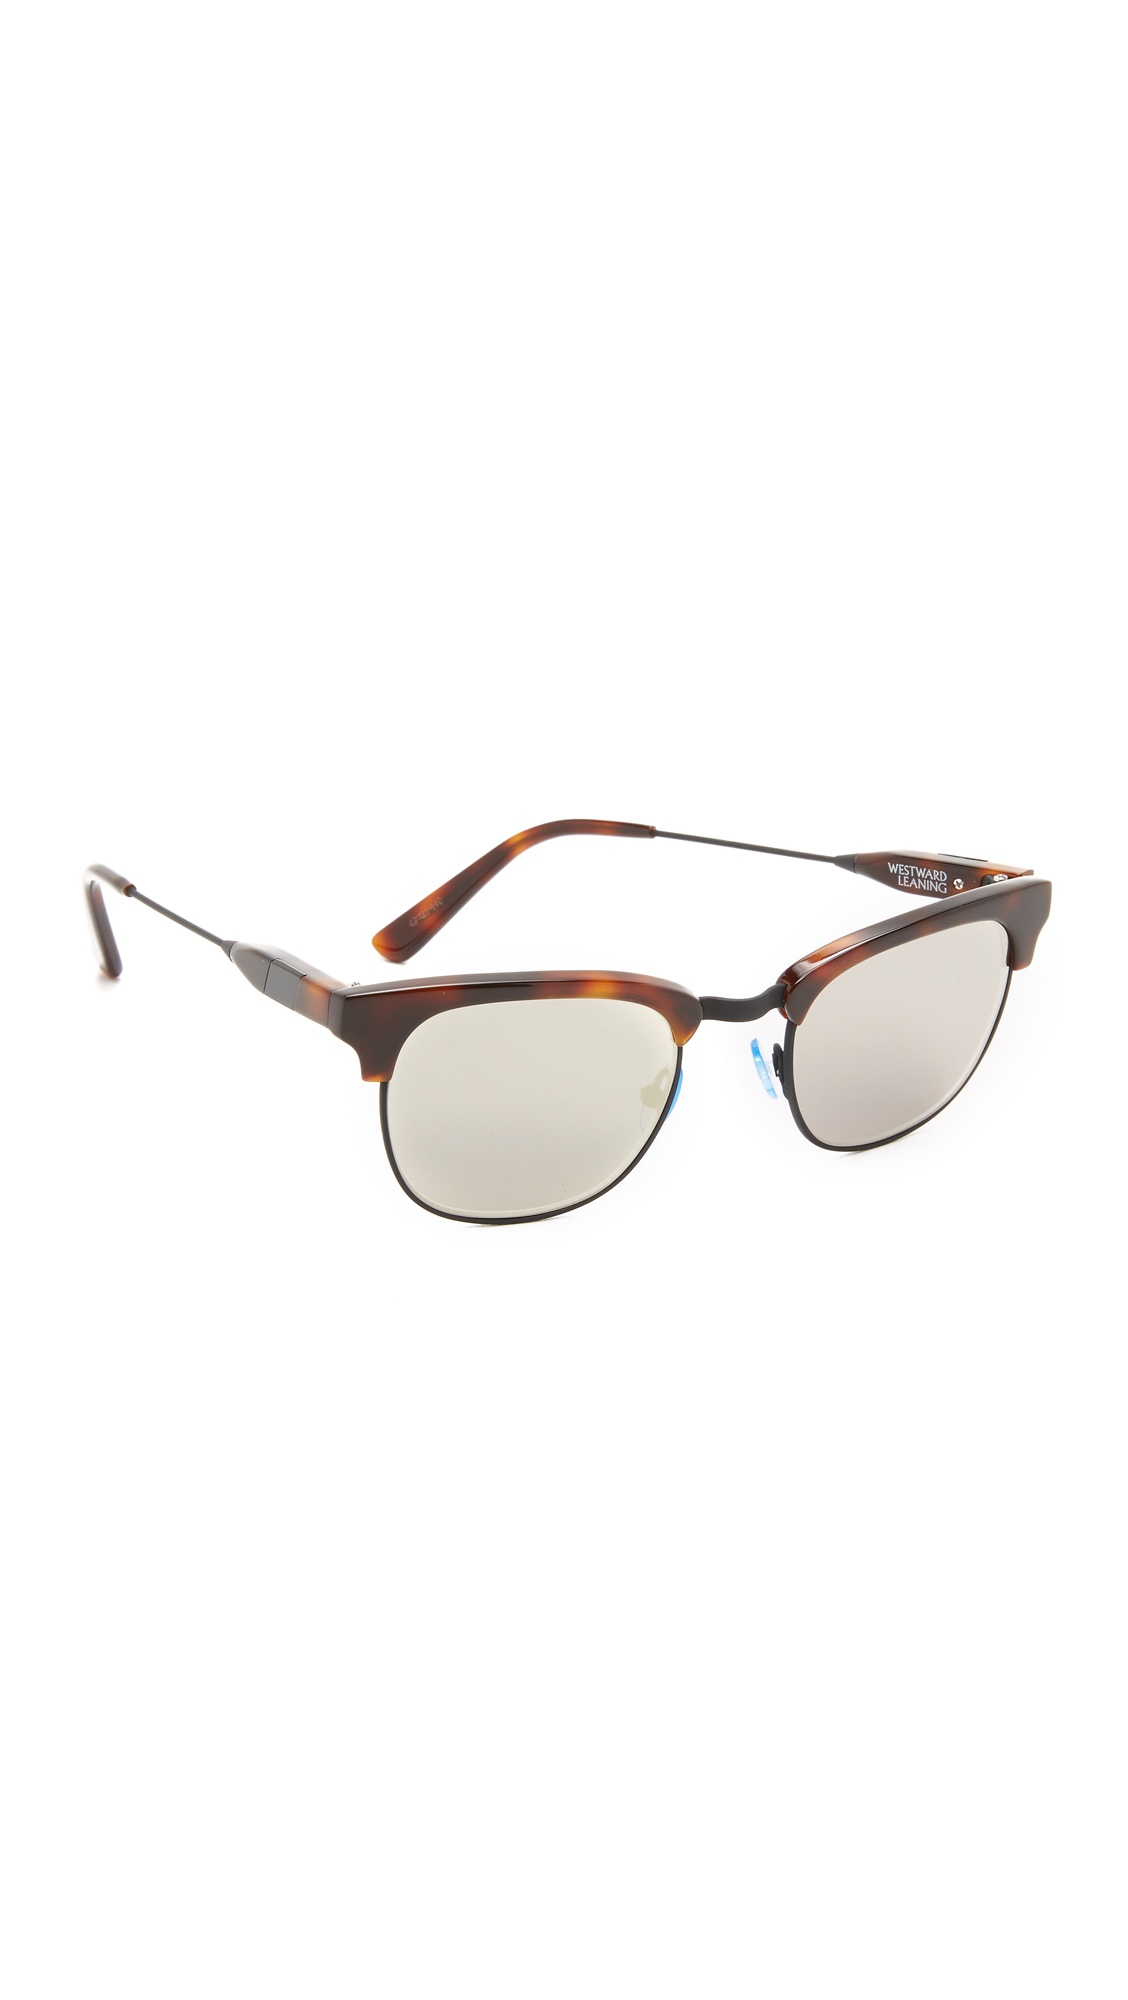 26aa161c436 Lyst - Westward Leaning Flat Lense Vanguard 17 Sunglasses in Brown